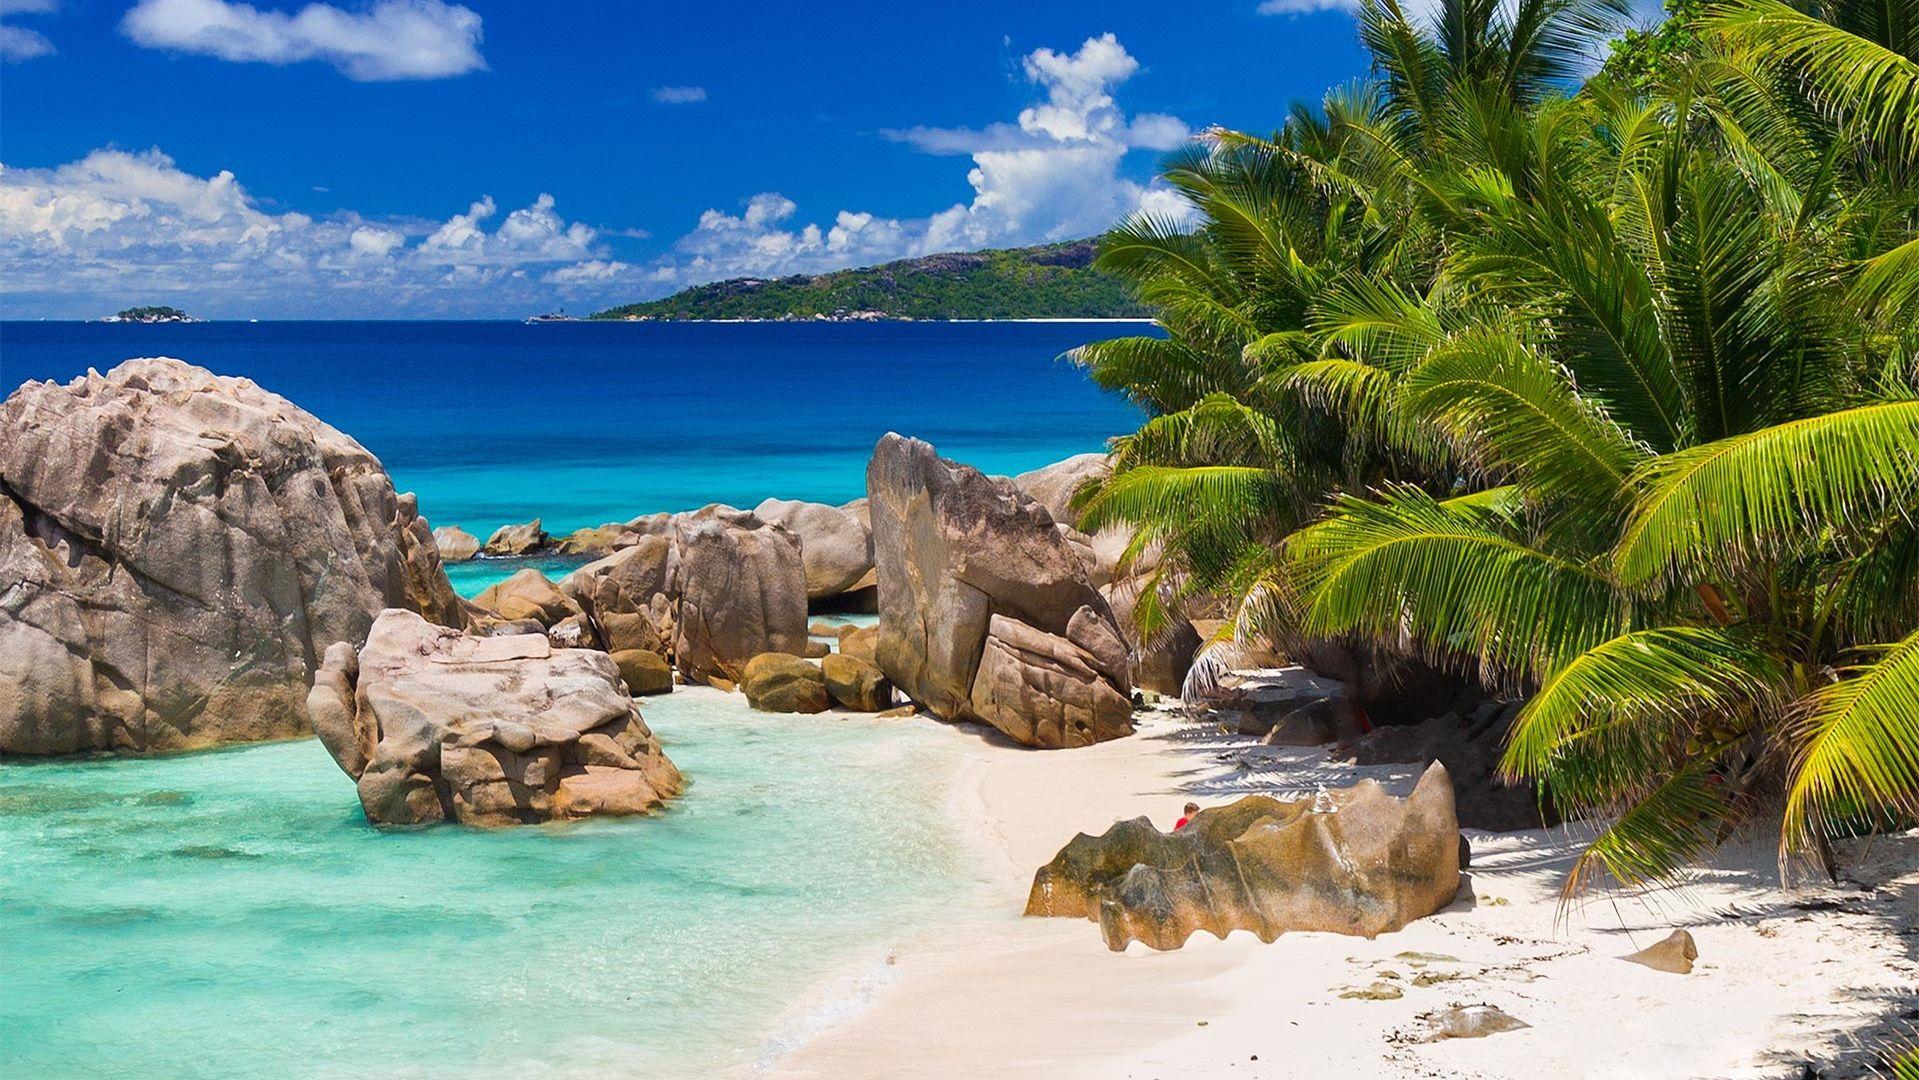 Sejur Luxury Seychelles cu Razvan Pascu, 12 zile - februarie 2022